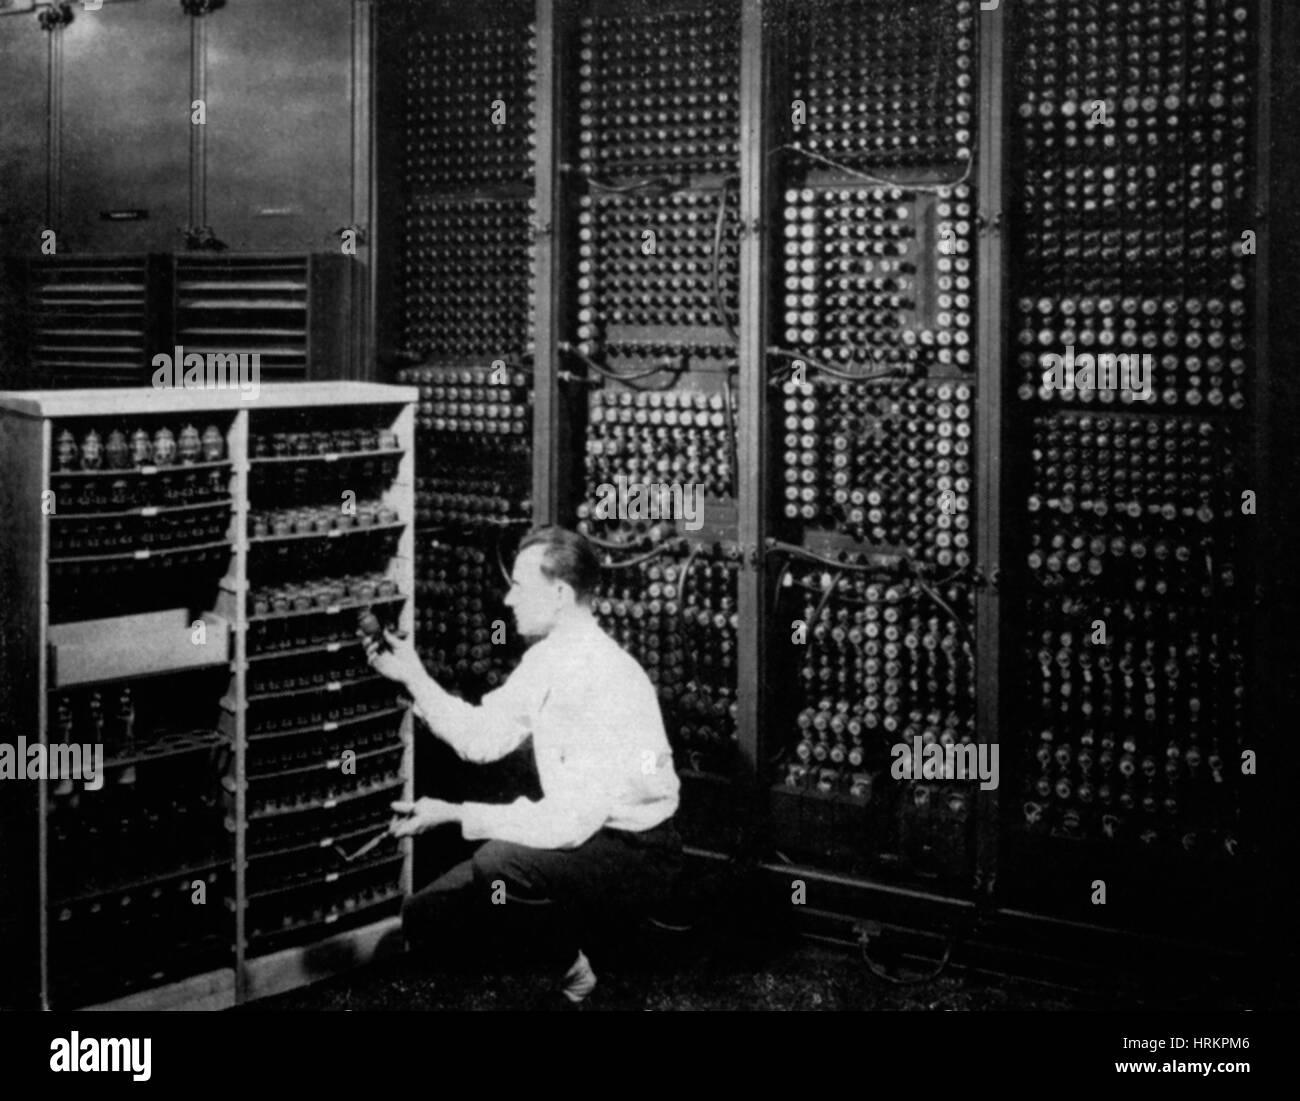 Replacing Bad Tube On ENIAC Computer Stock Photo: 135044566 - Alamy